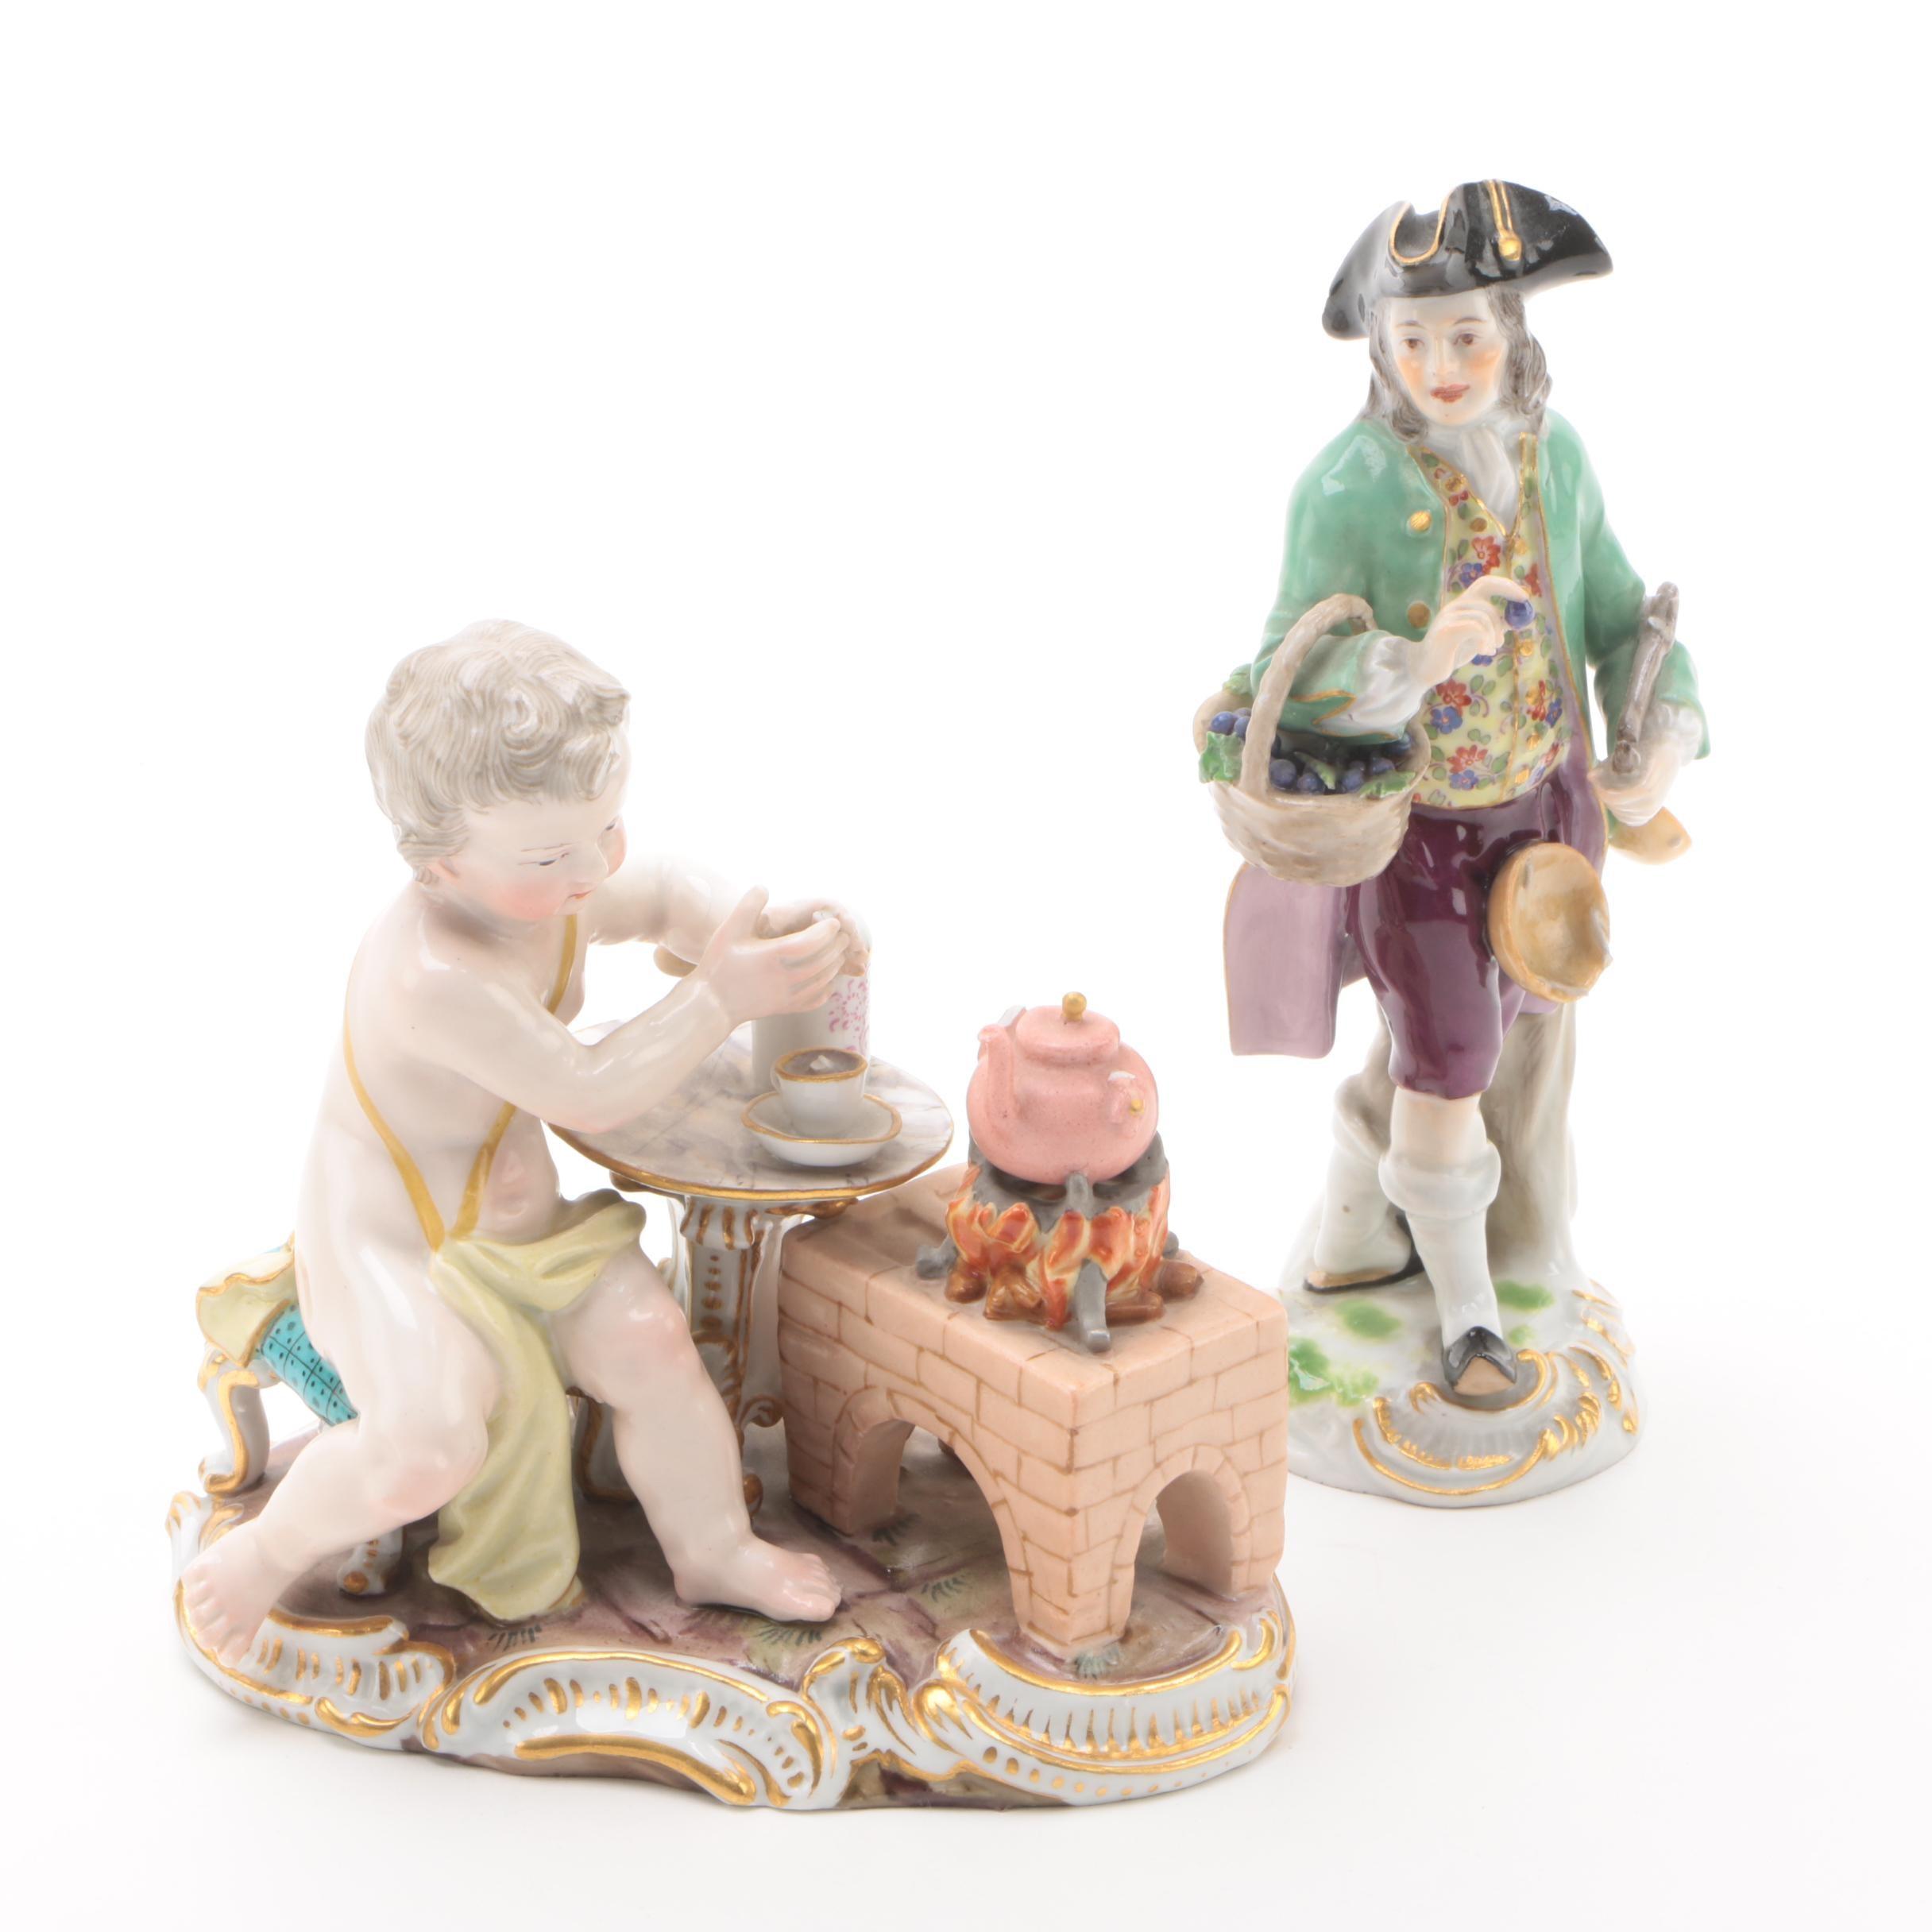 19th Century Meissen Porcelain Figurines